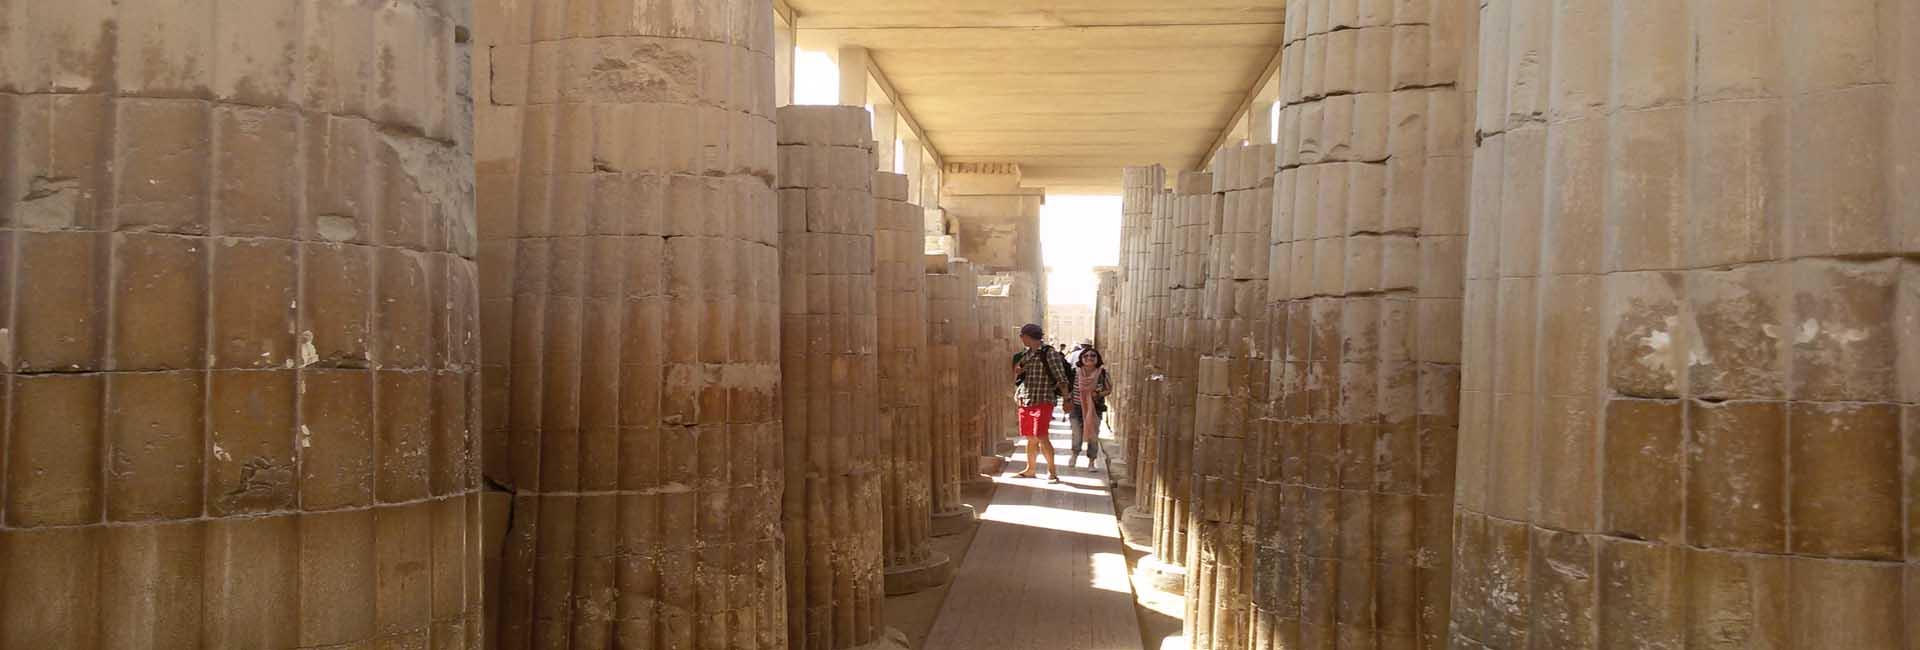 Saqqara, Memphis & Dahshur Pyramids